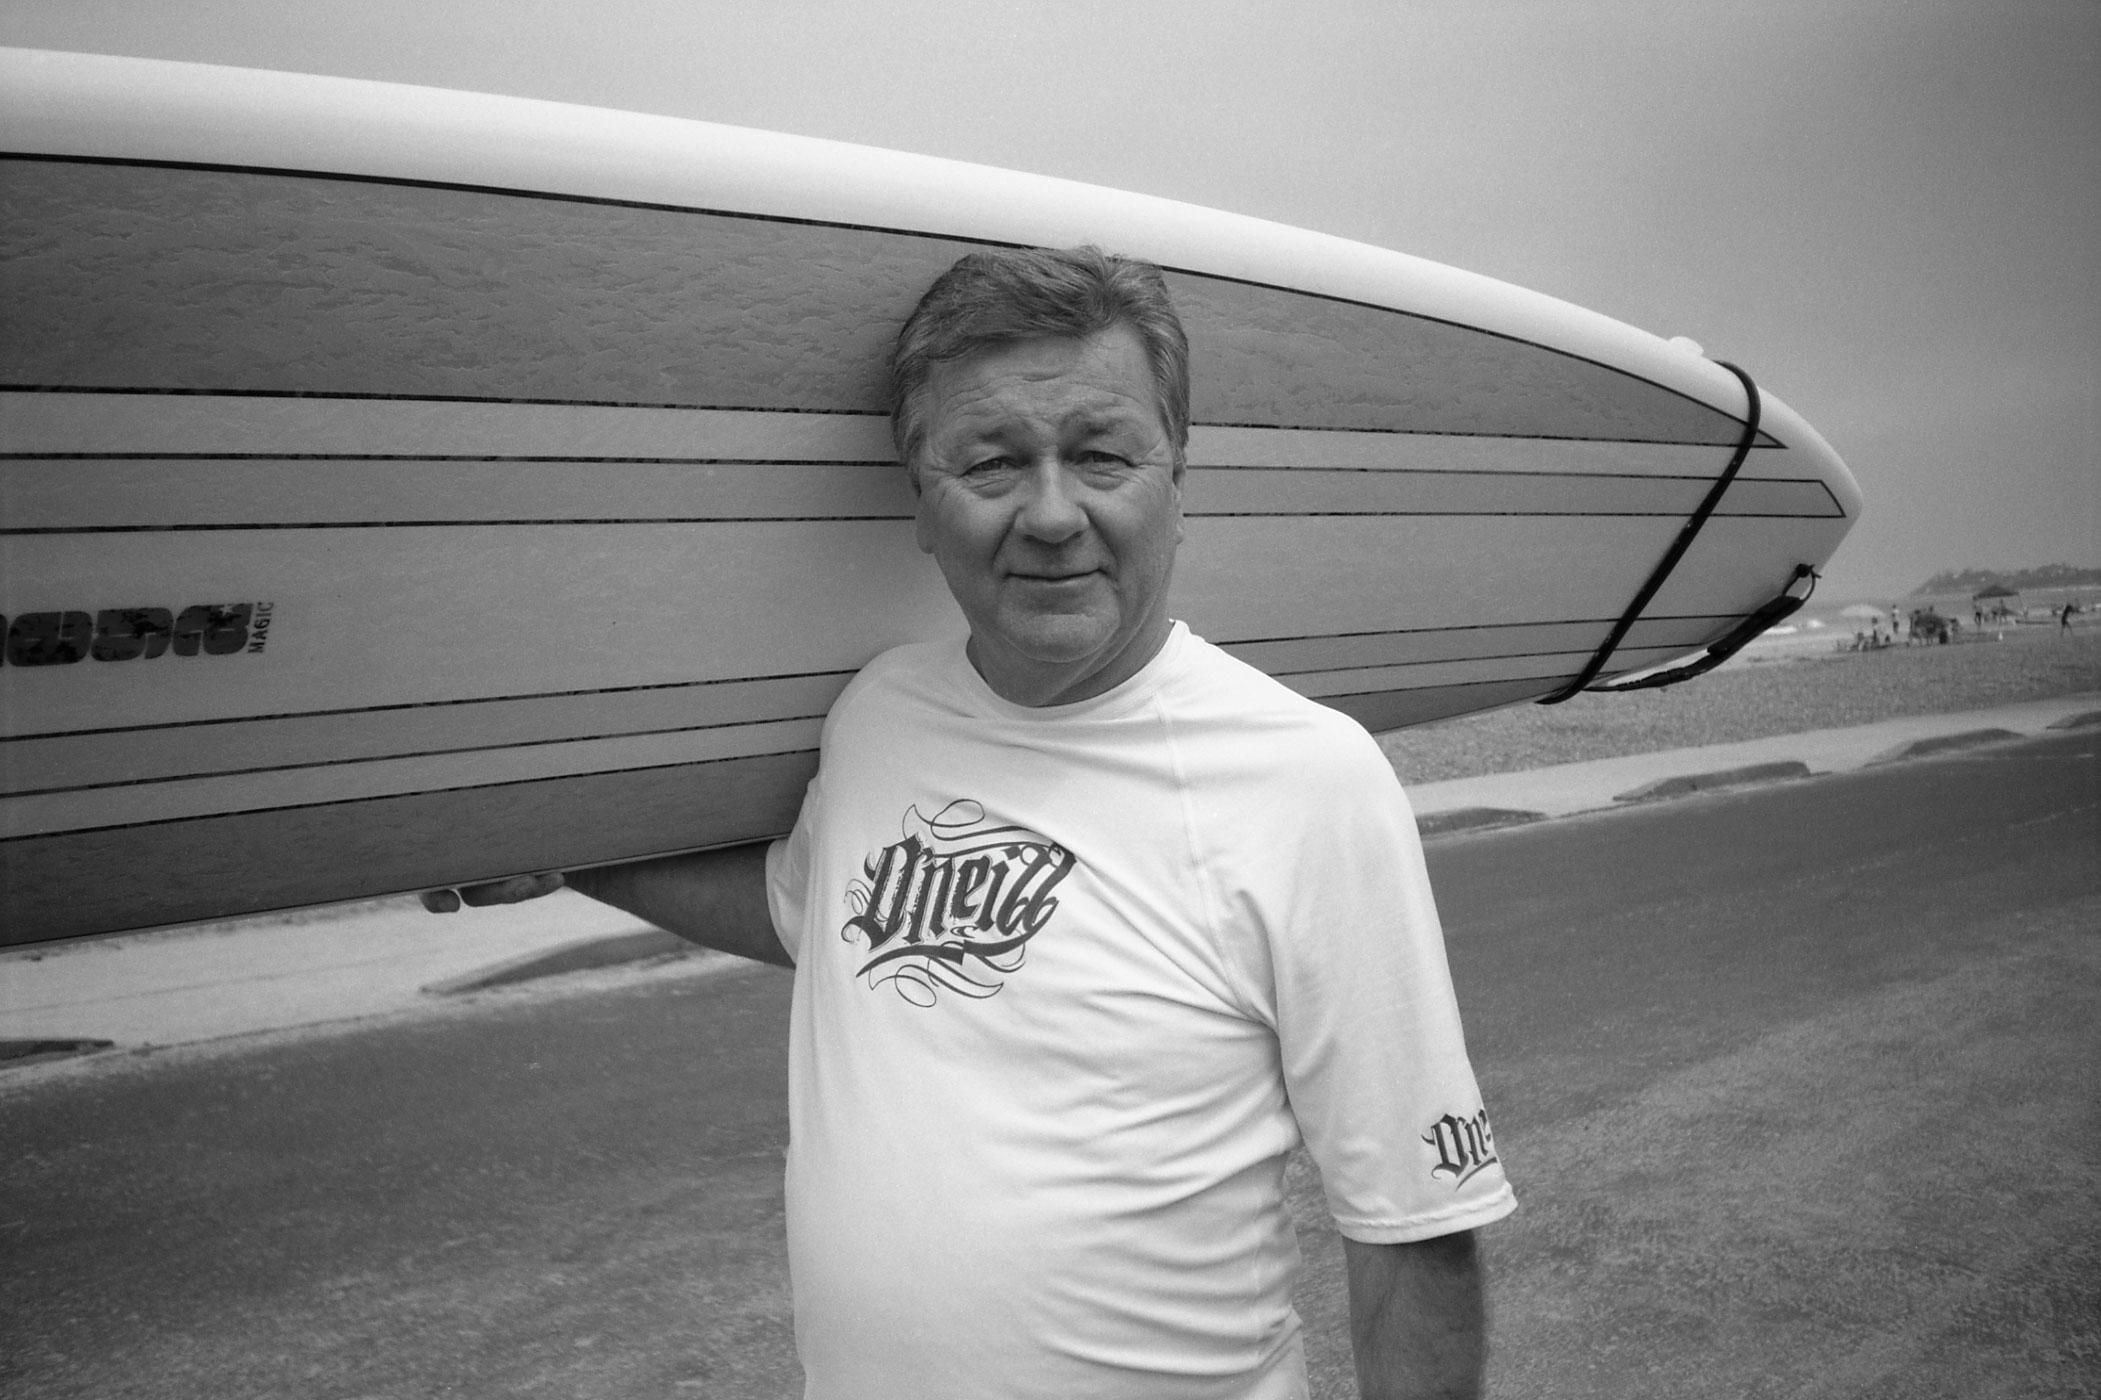 DadWithSurfboard-4.56.2014.jpg